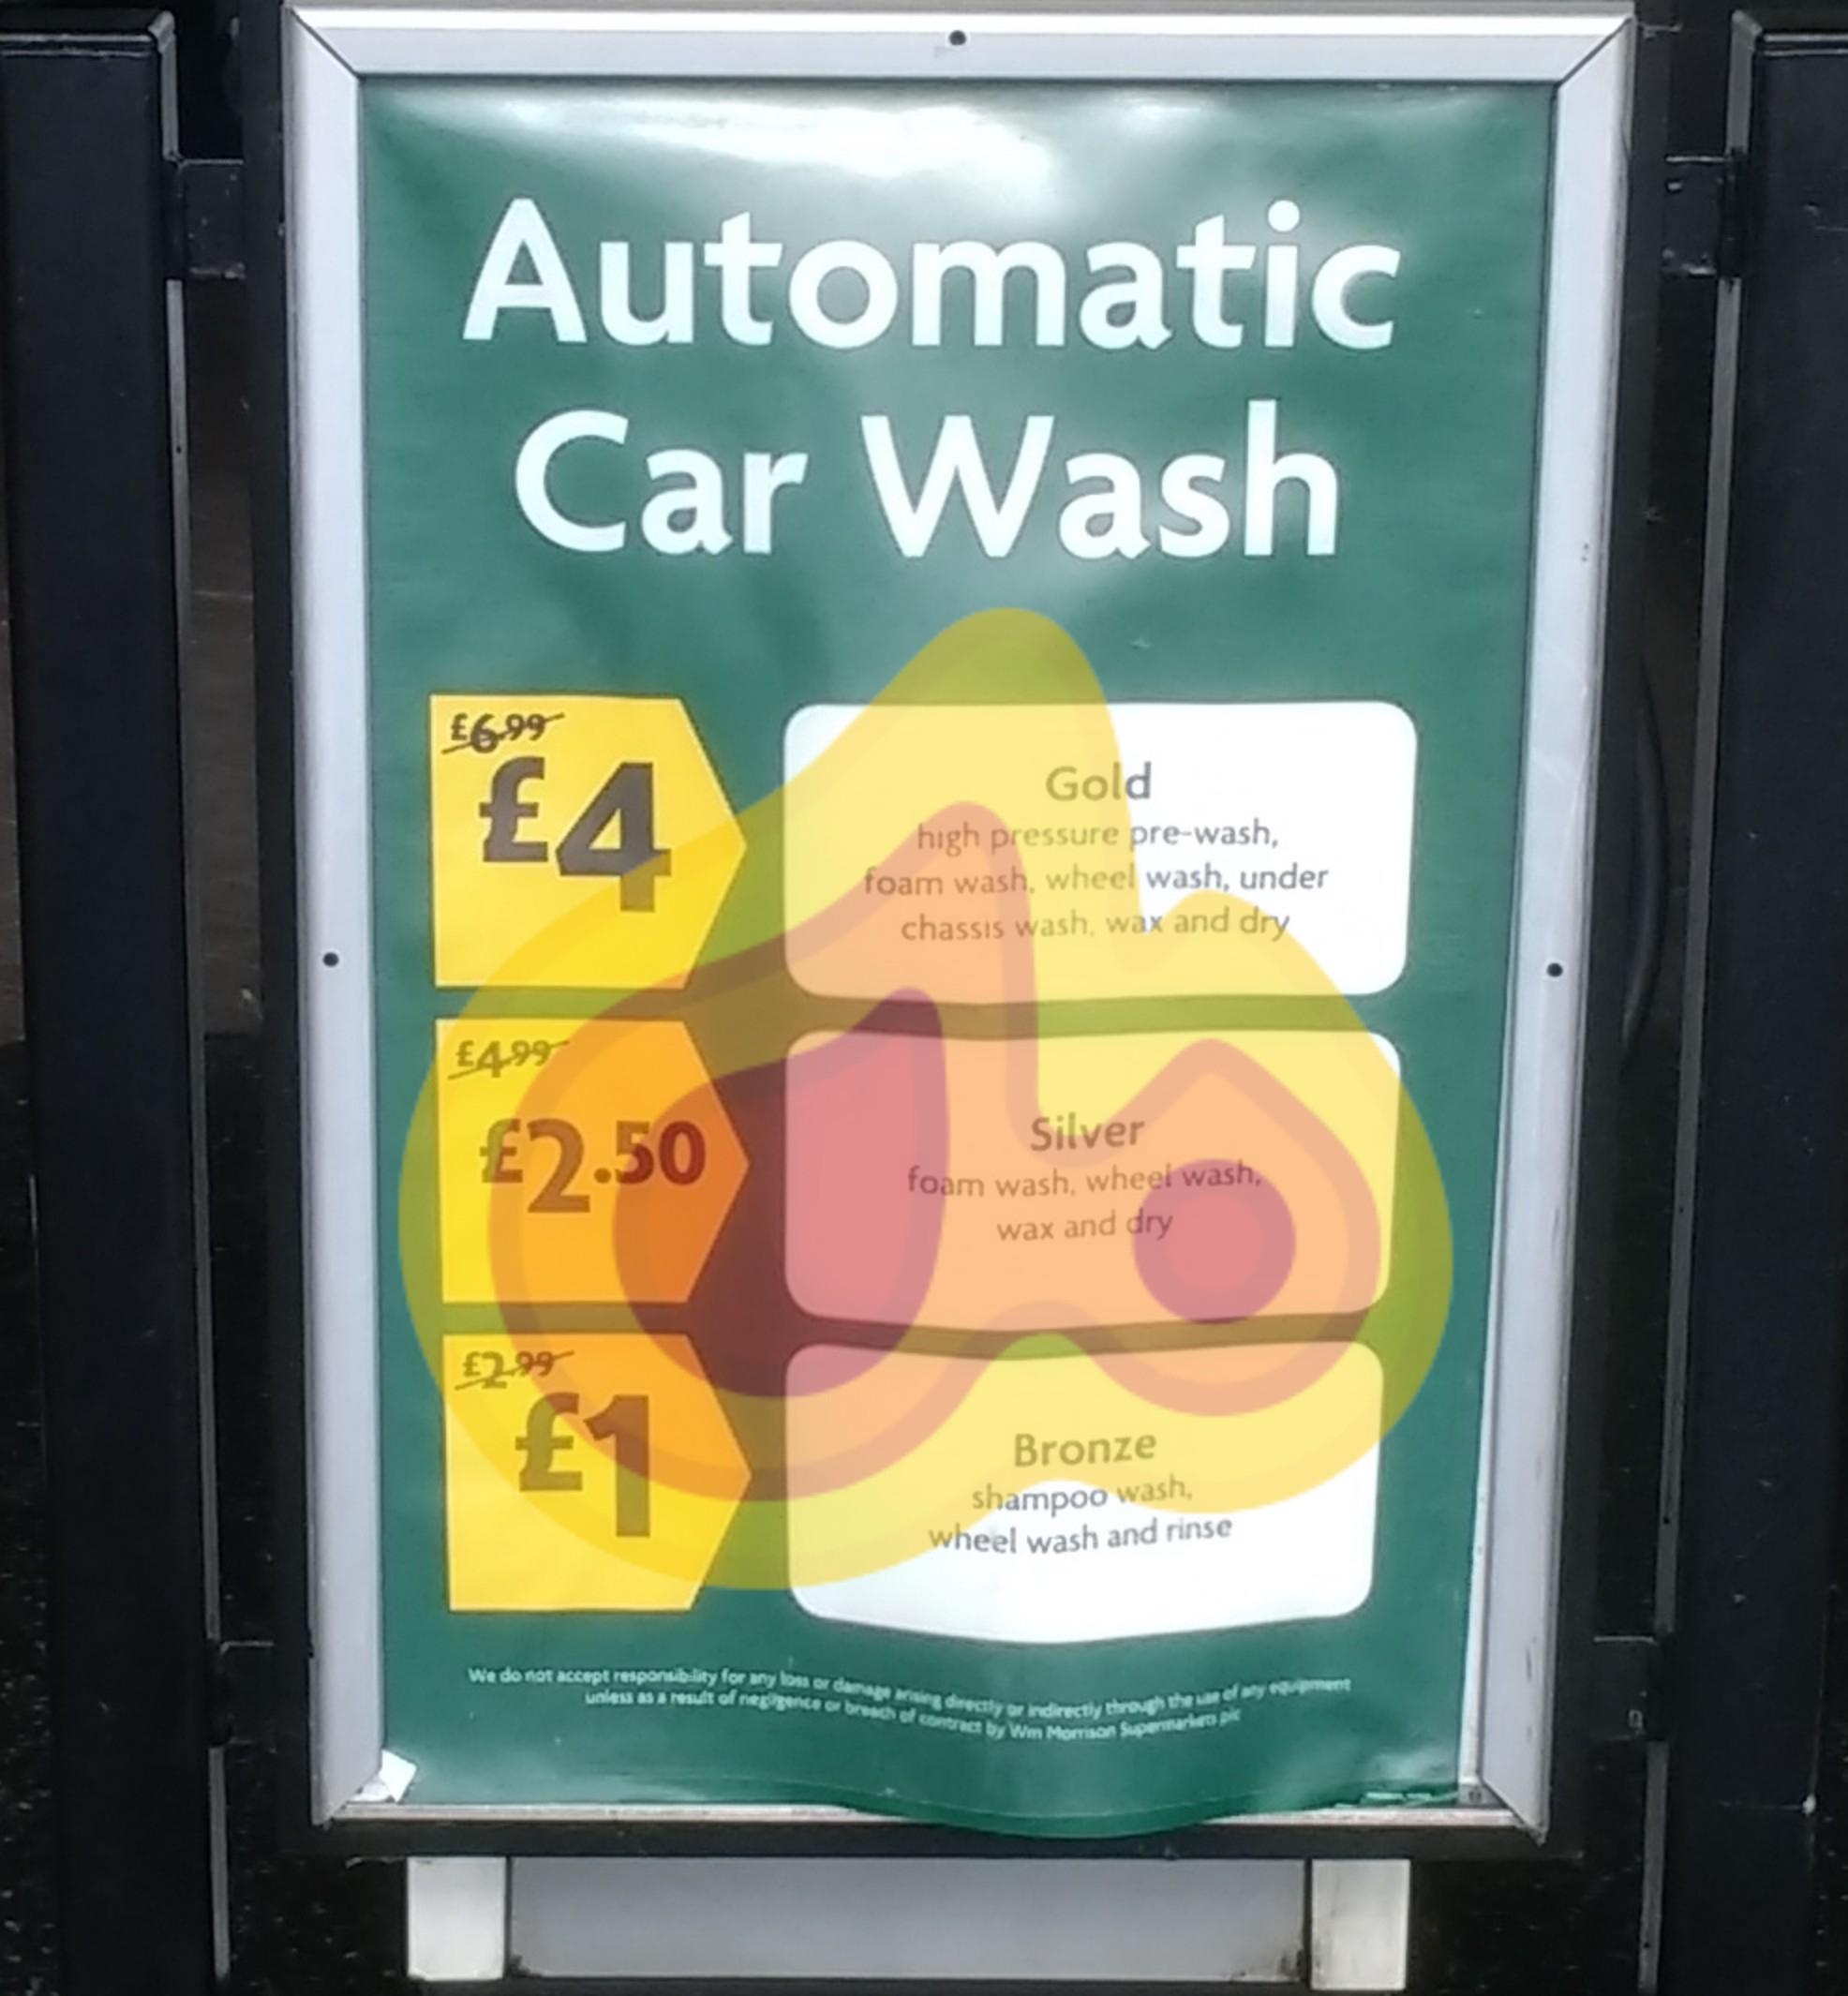 £1 Automatic Car Wash (was £2.99) @ Morrisons